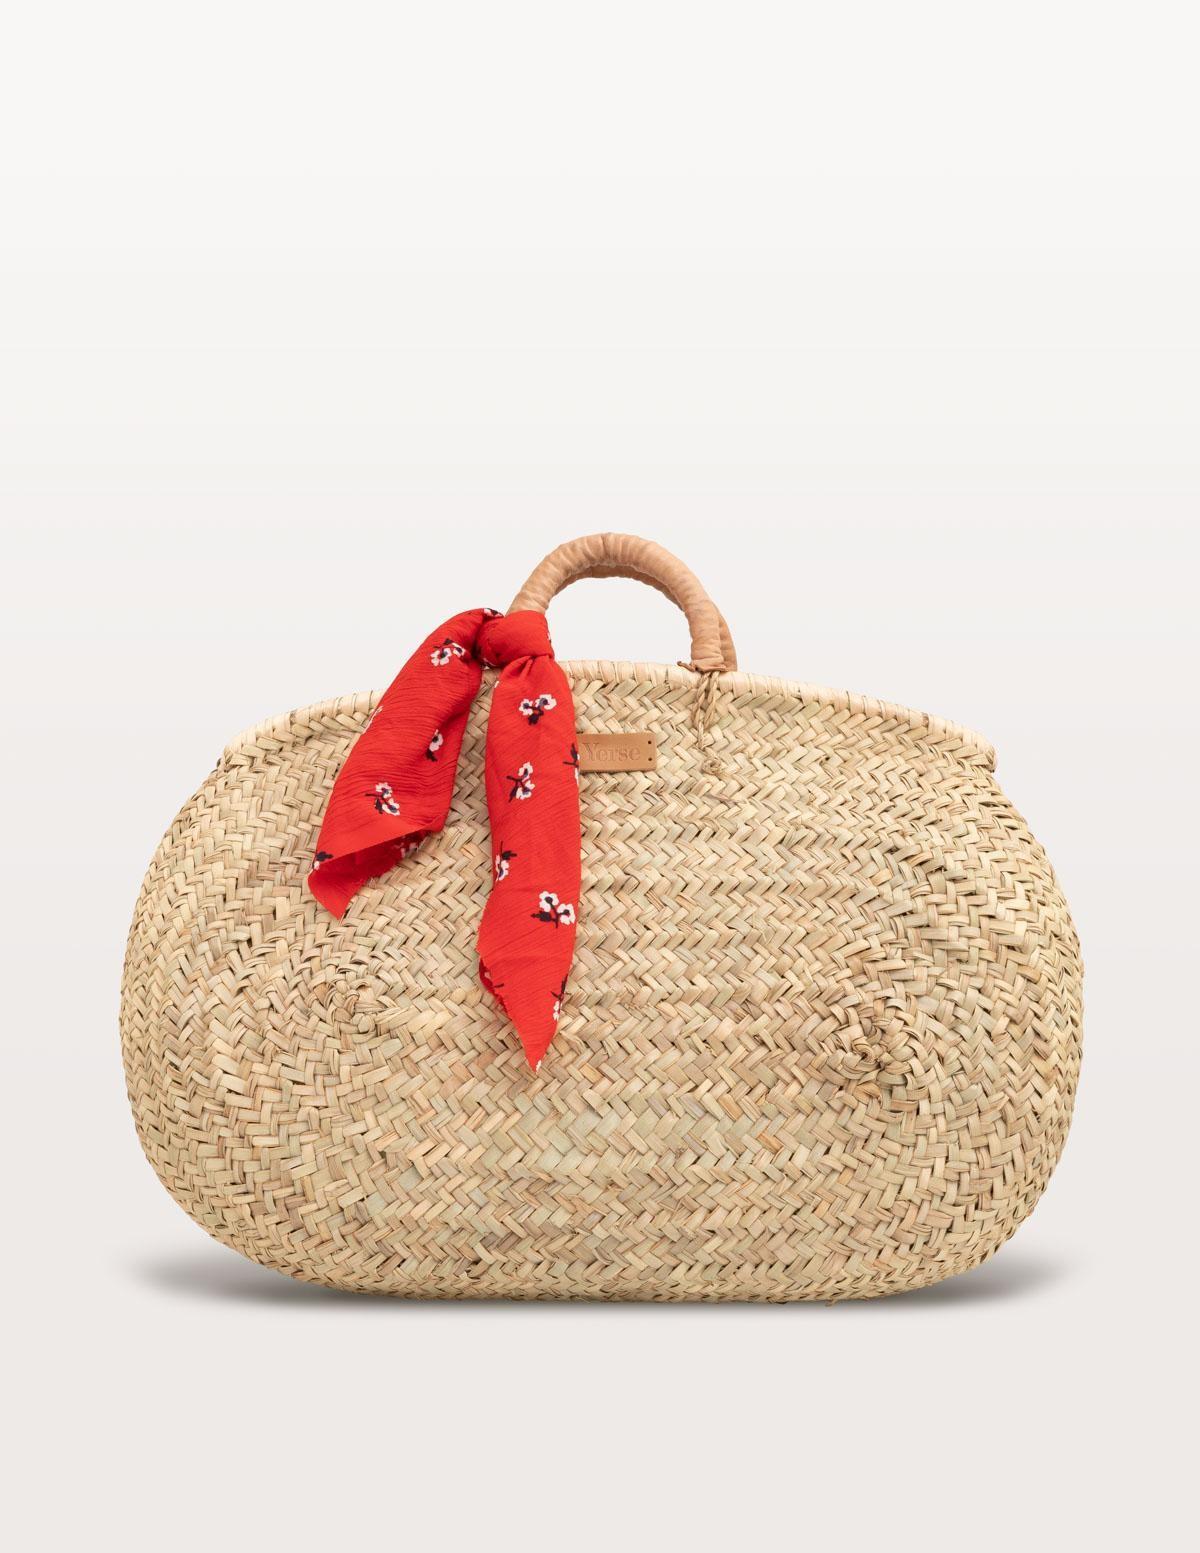 Wicker basket with foulard detail